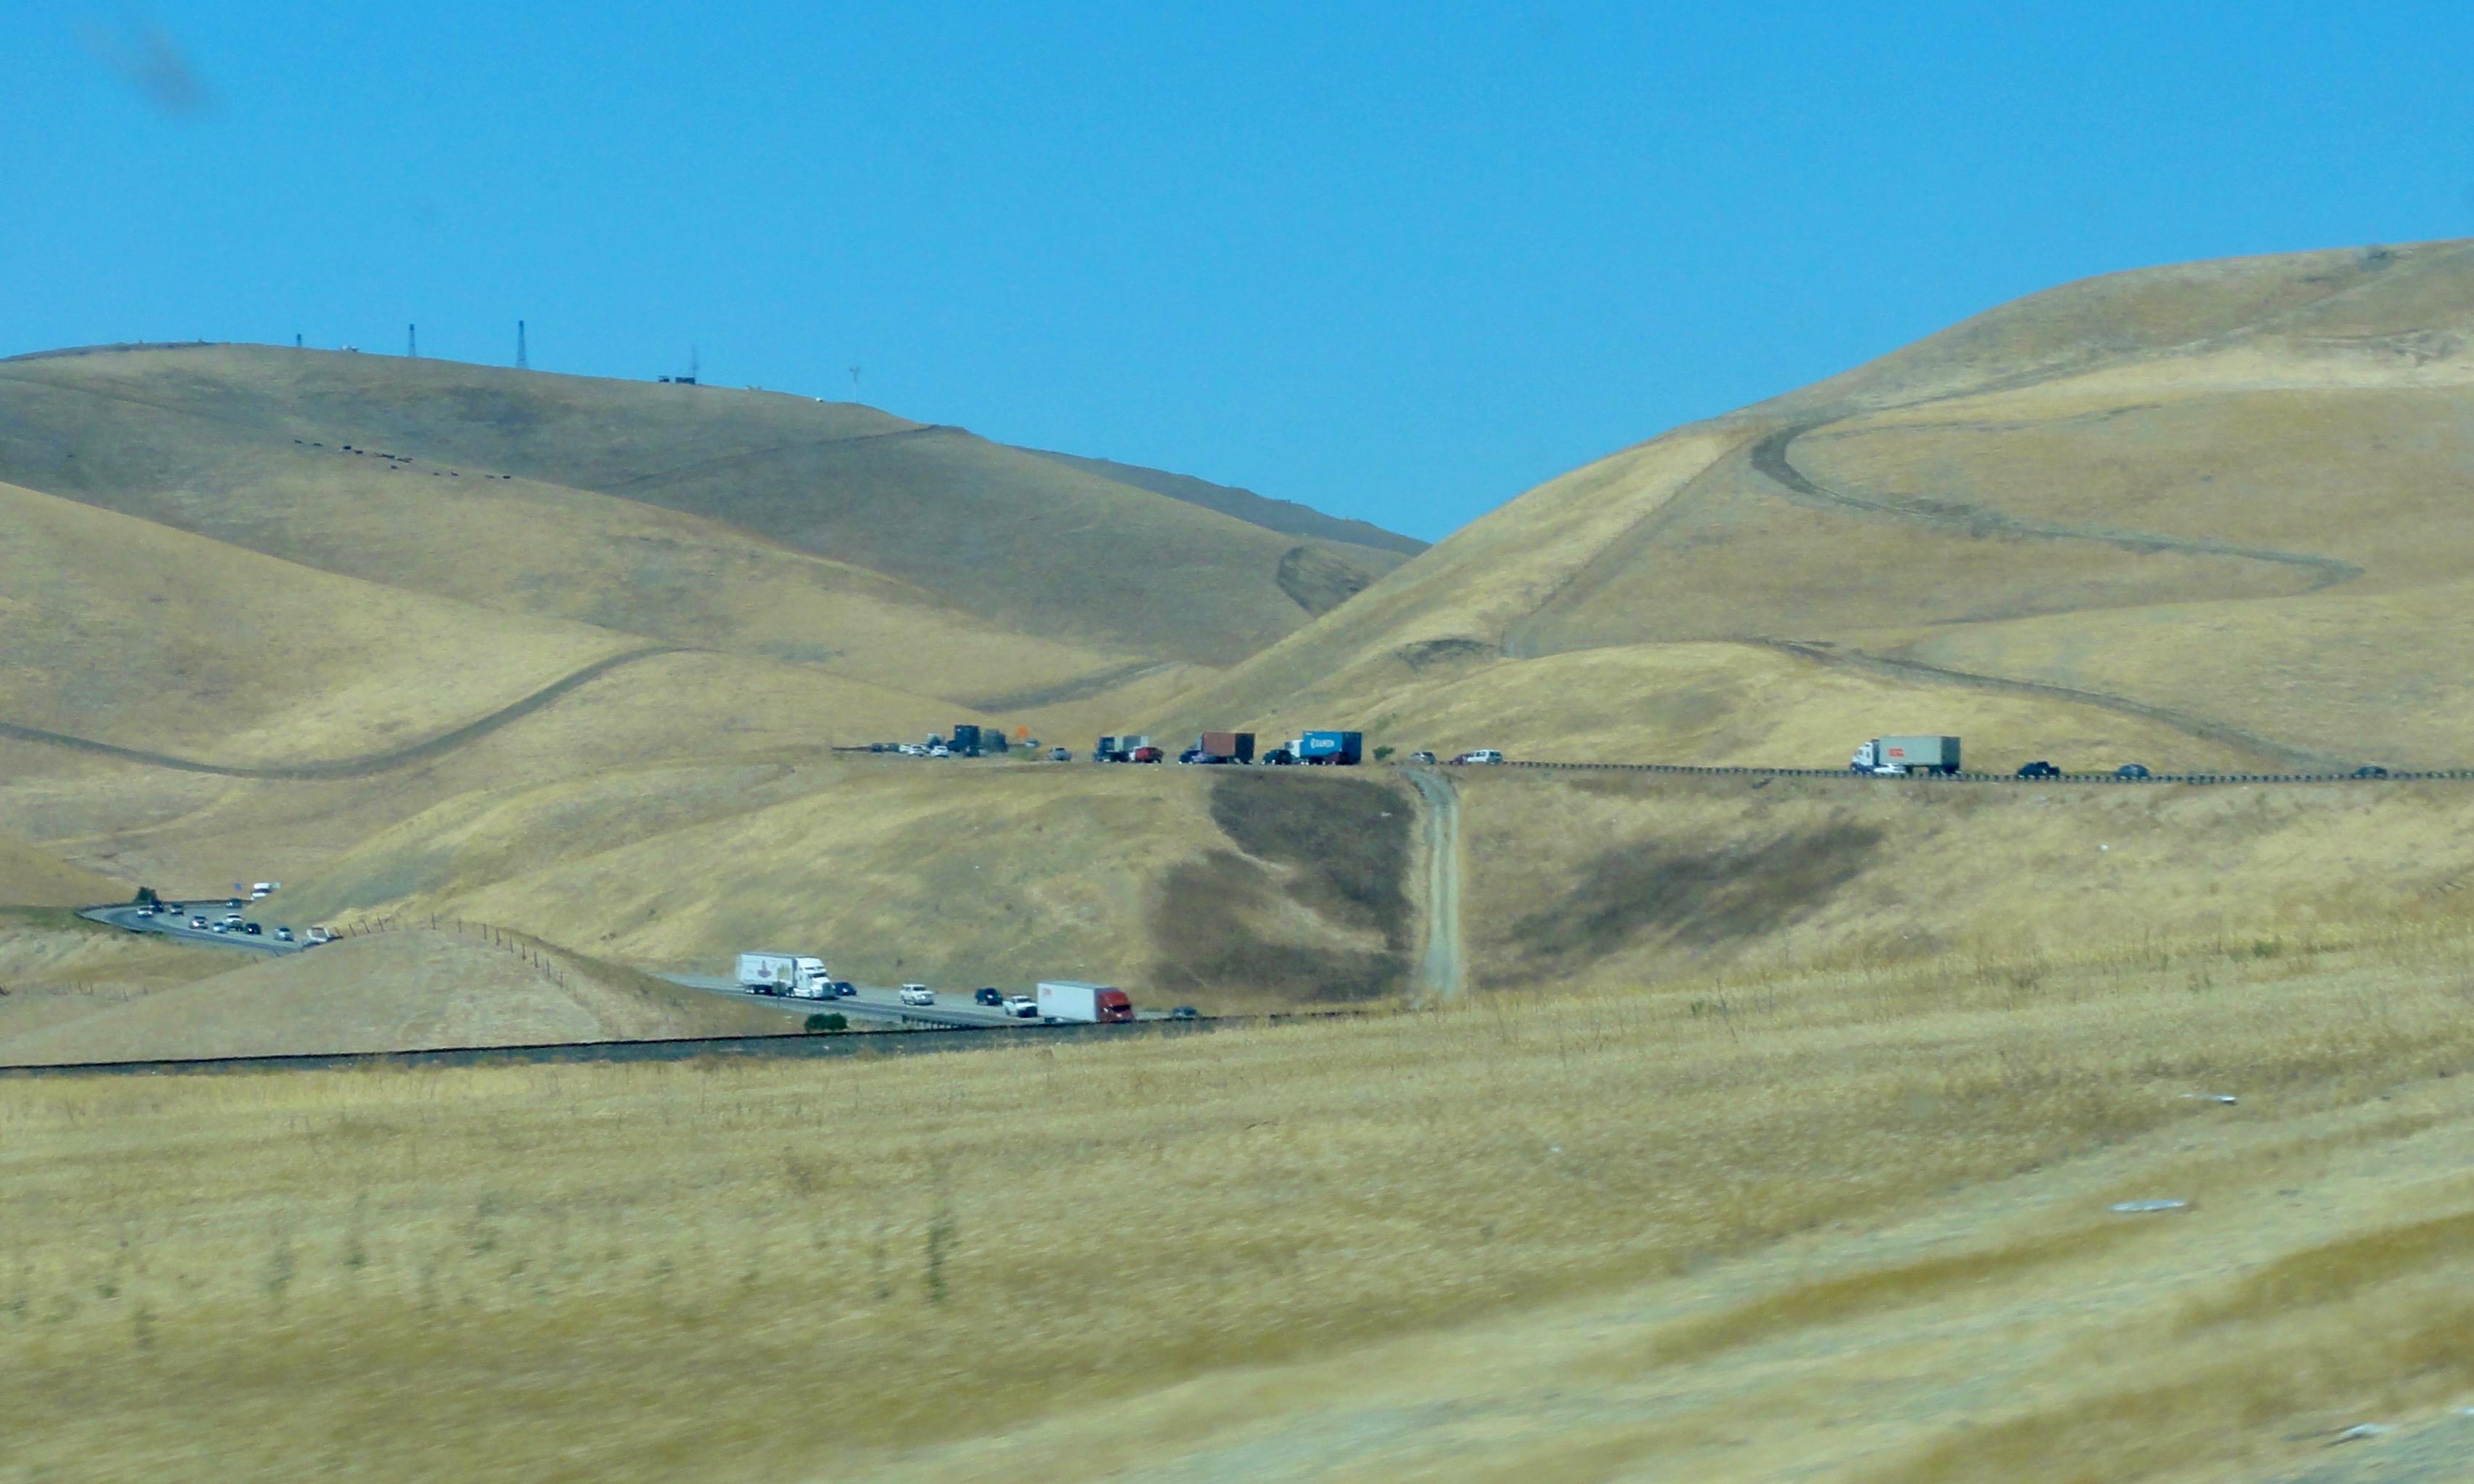 File:Altamont Pass jpg - Wikipedia